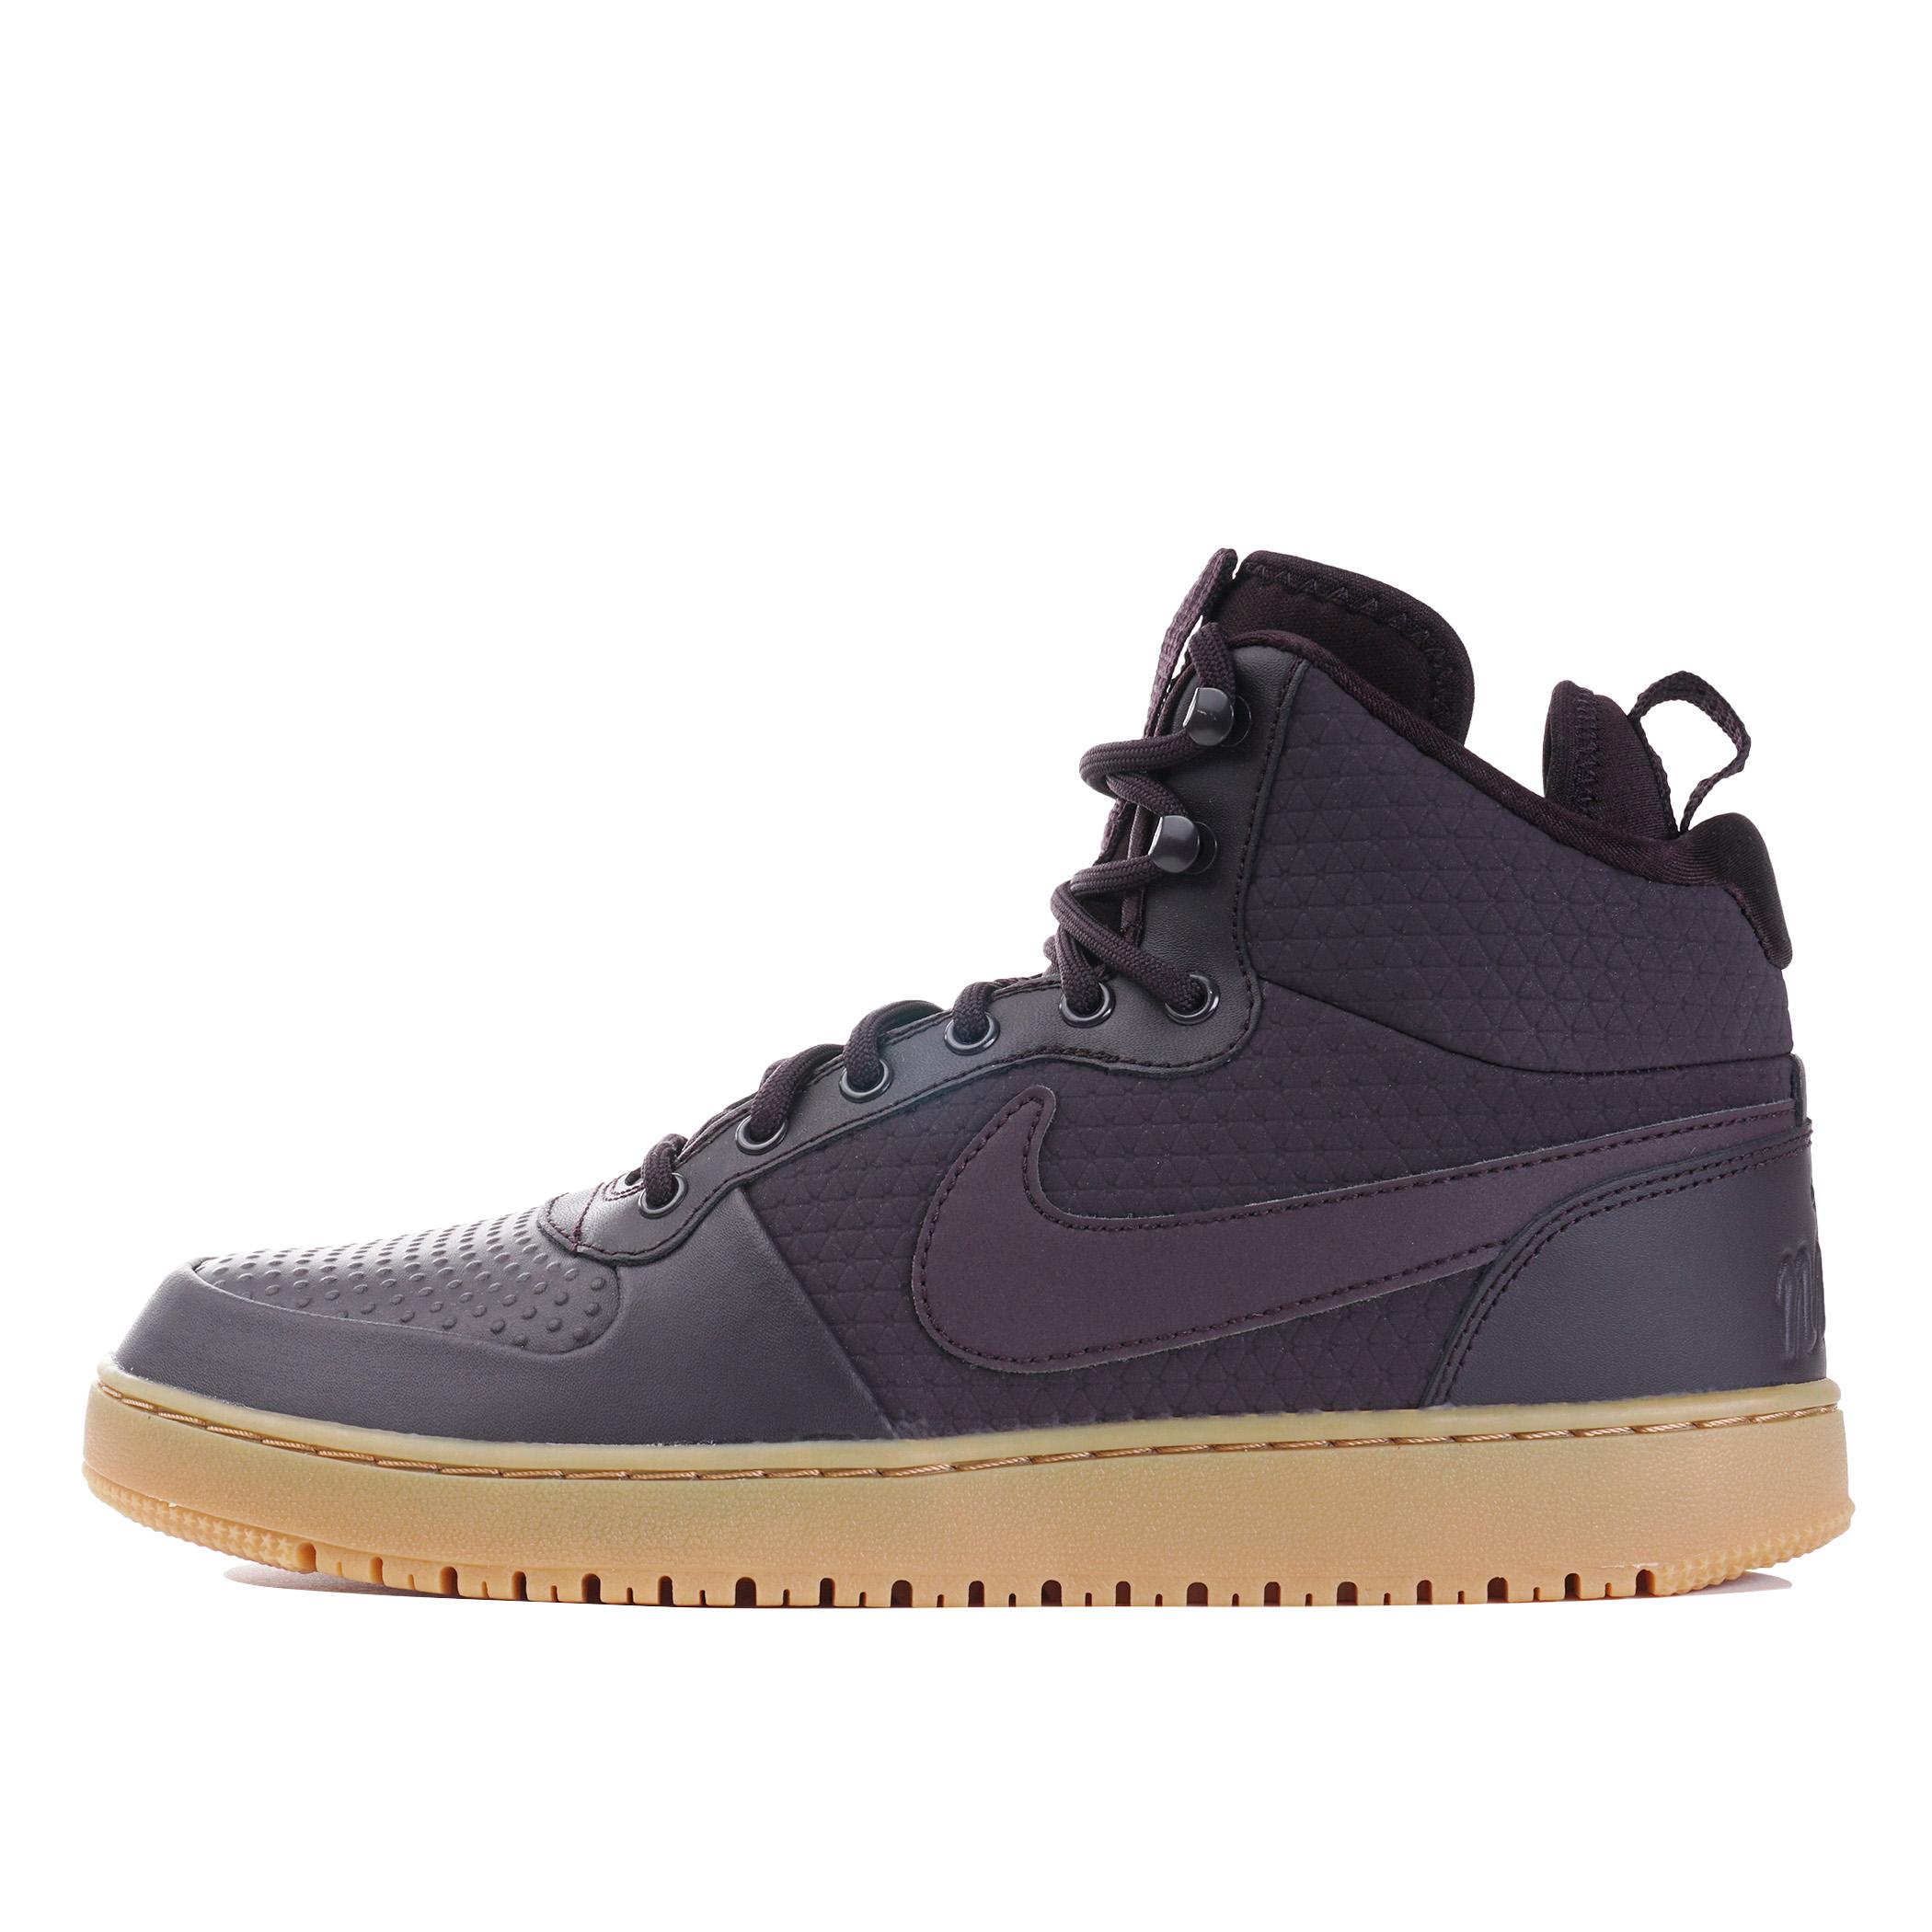 7b525e85 Кроссовки EBERNON от Nike (AQ8754-600) - продажа, цена, фото, описание